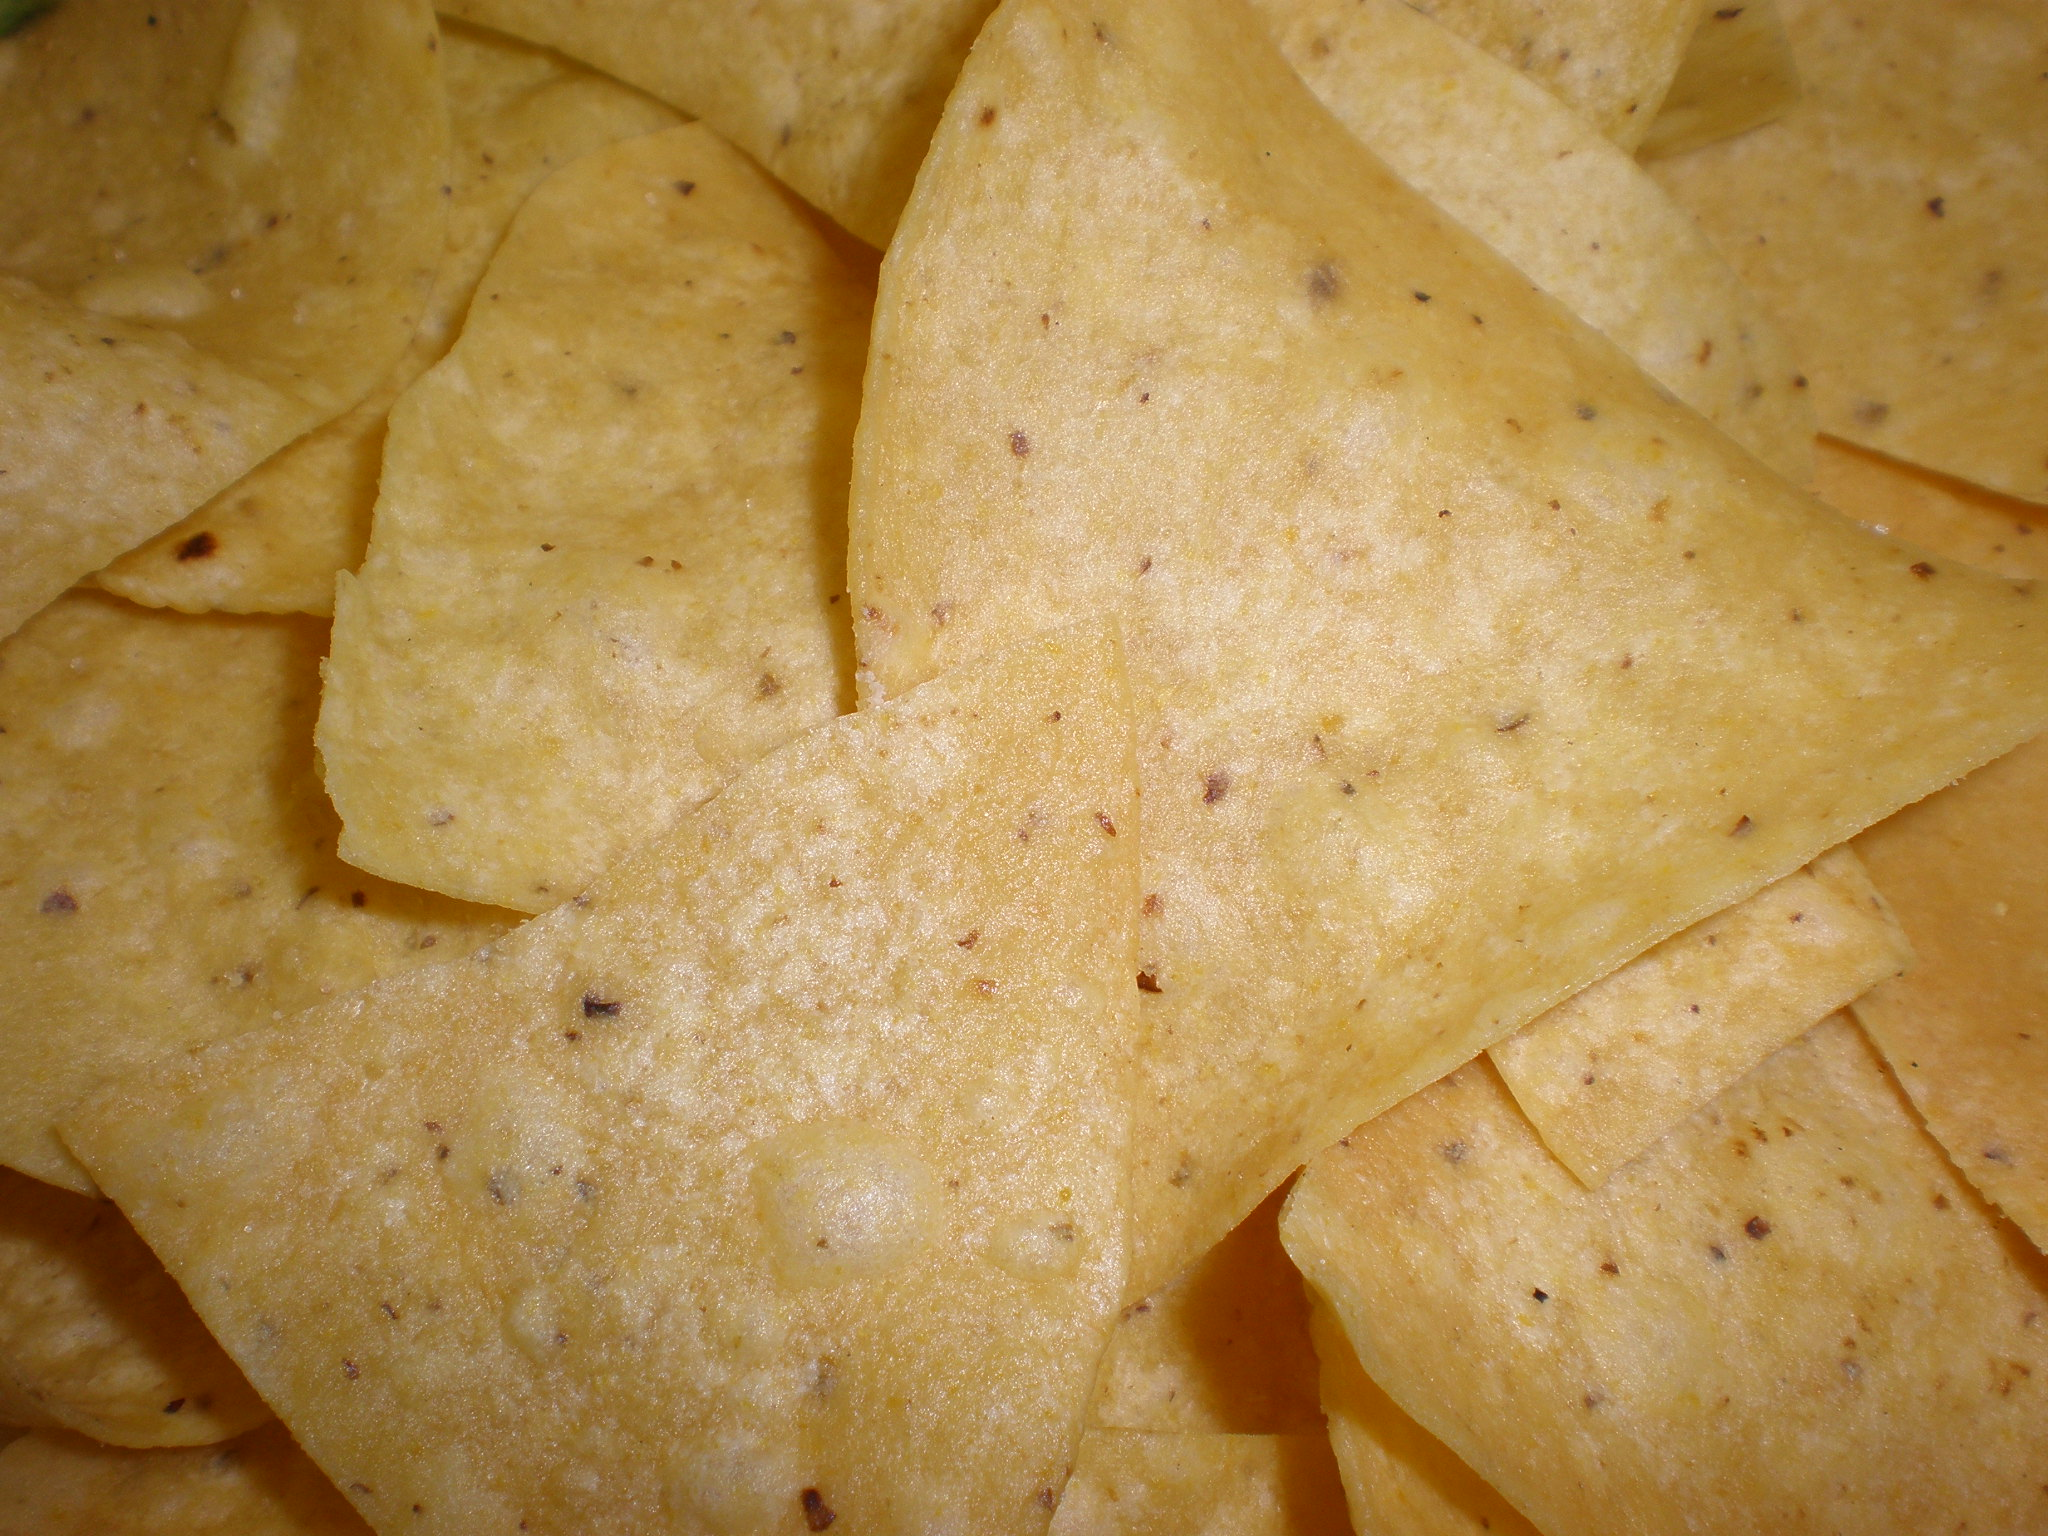 File:Tortilla chips.JPG - Wikimedia Commons